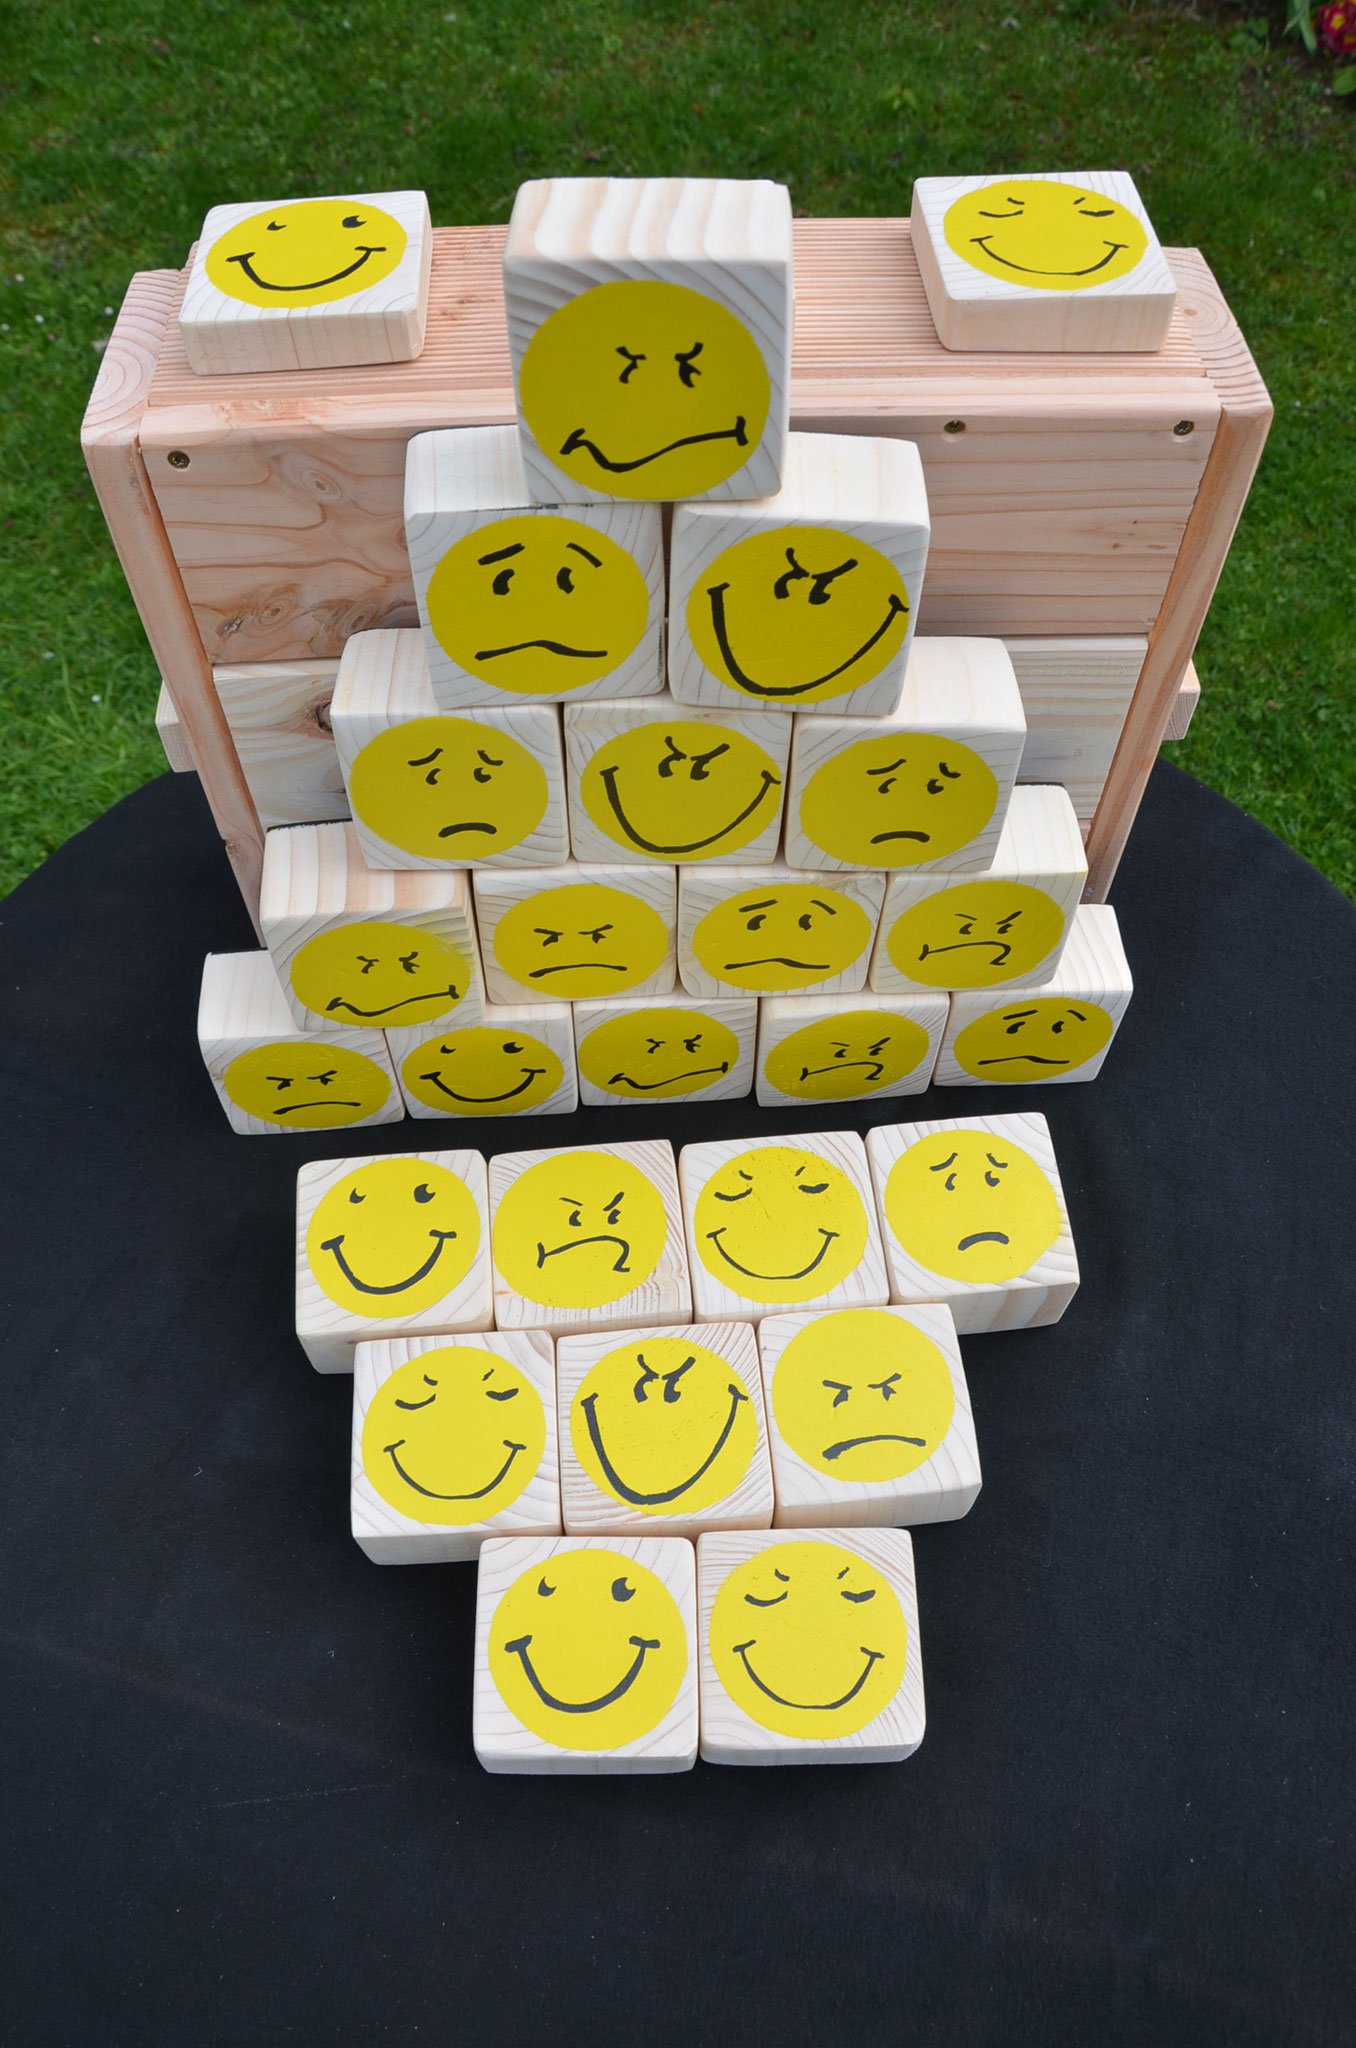 Meine Outdoorspiele: Smiley- Memo 3